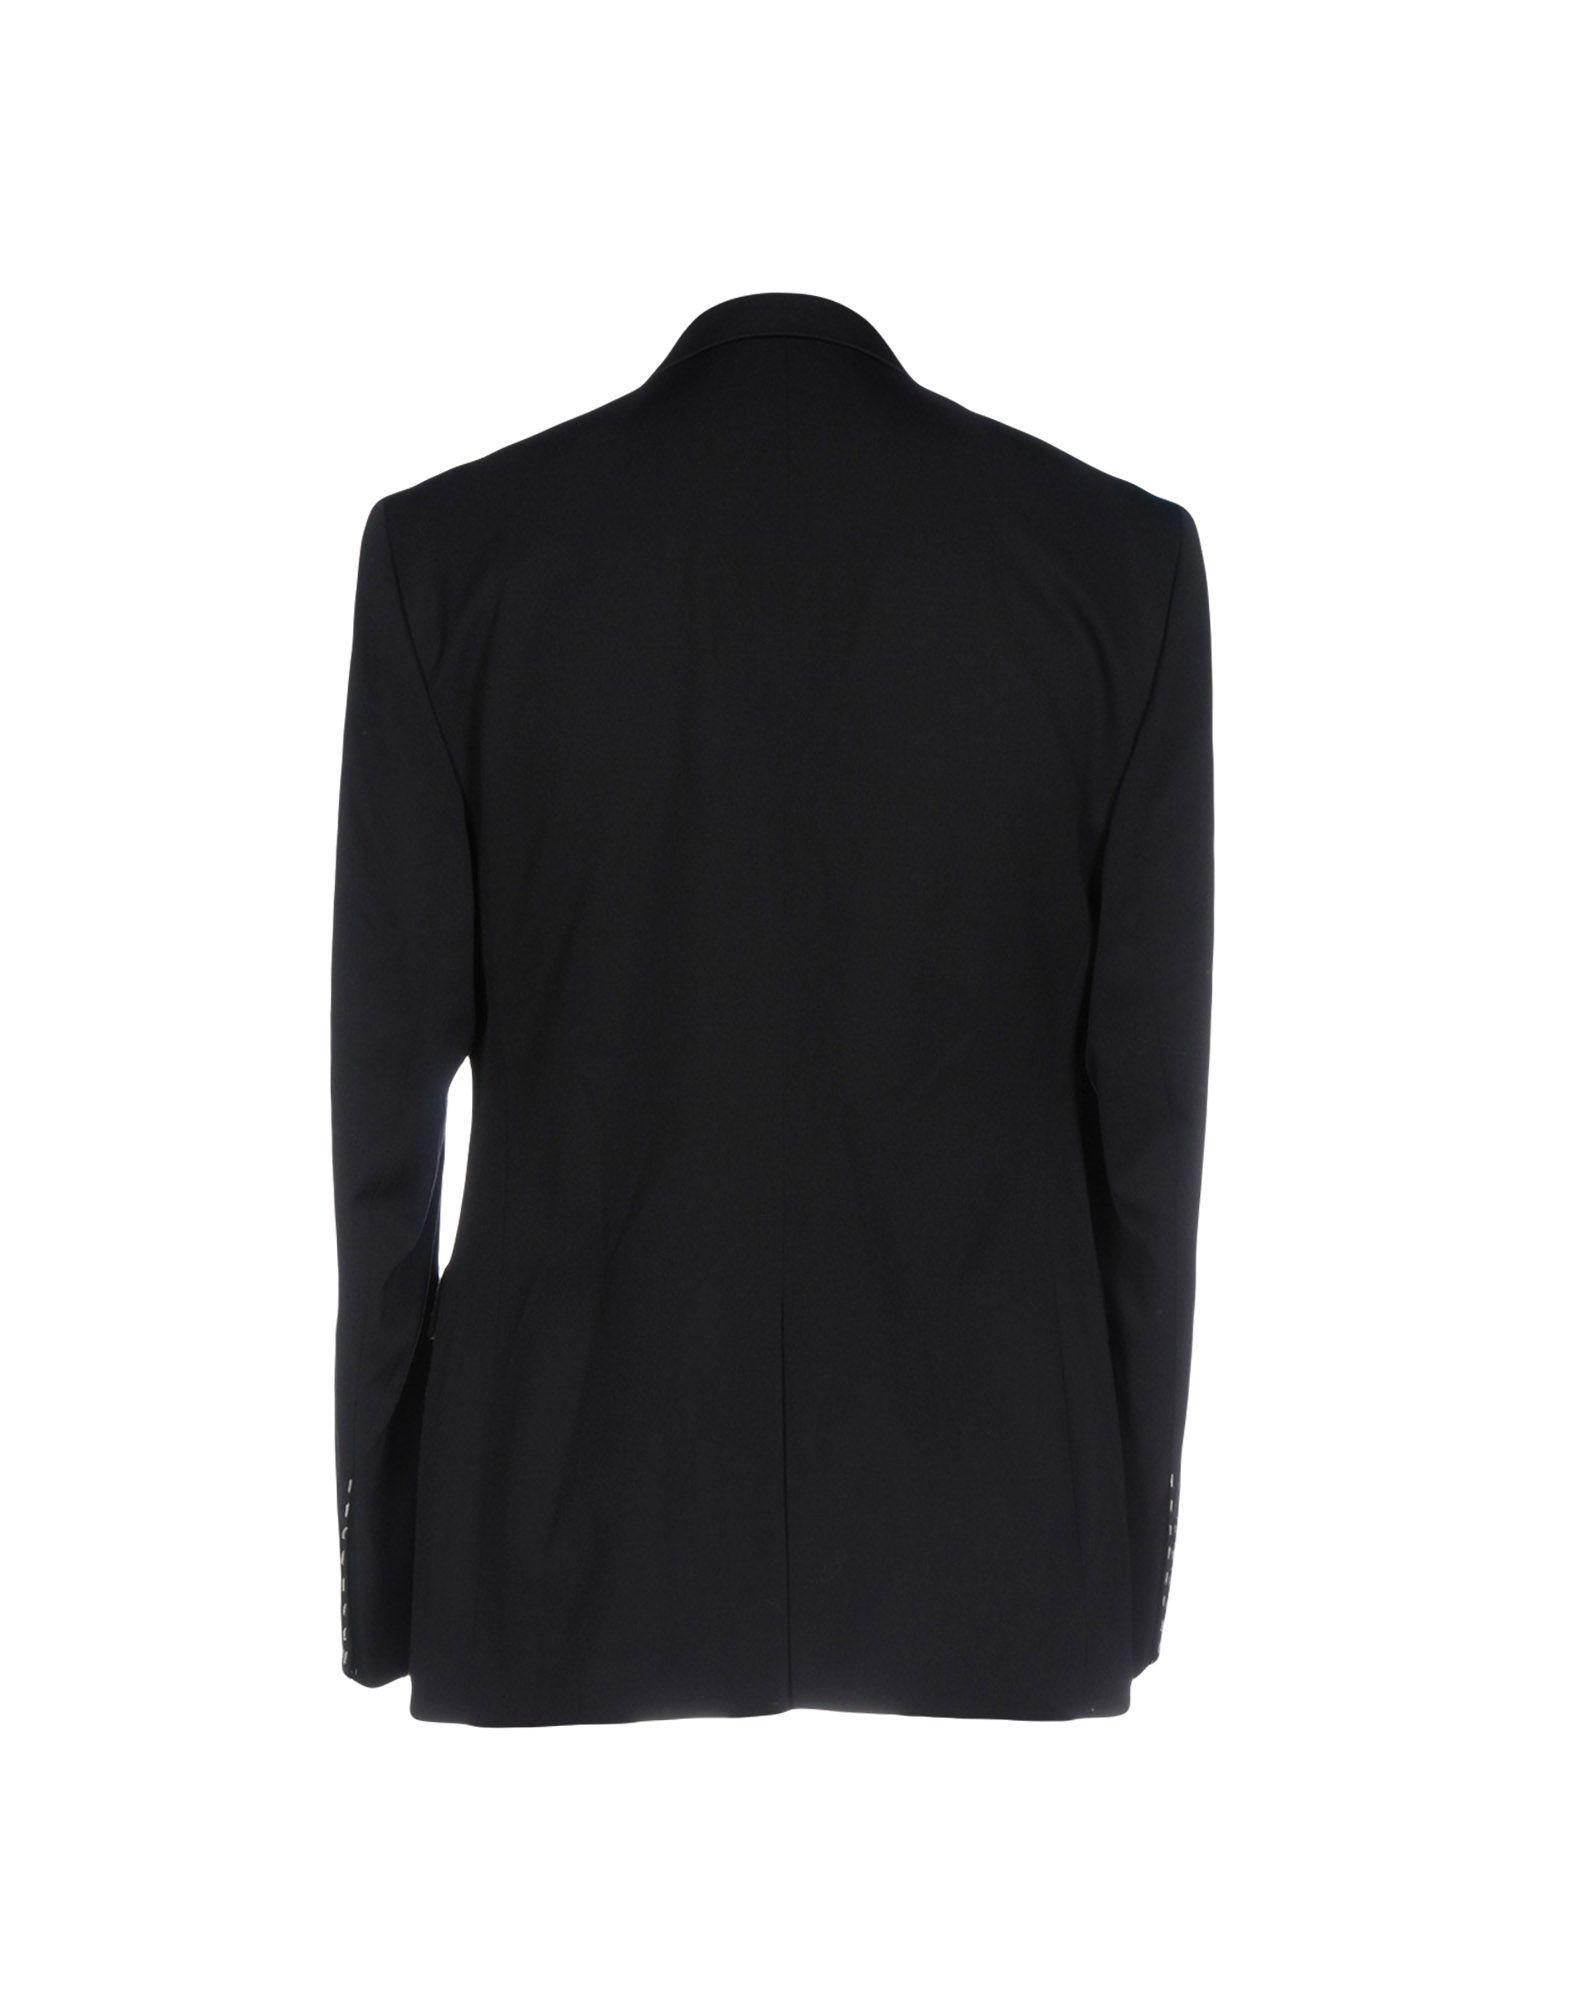 baffcb66509e Lyst - Veste Dior Homme en coloris Noir